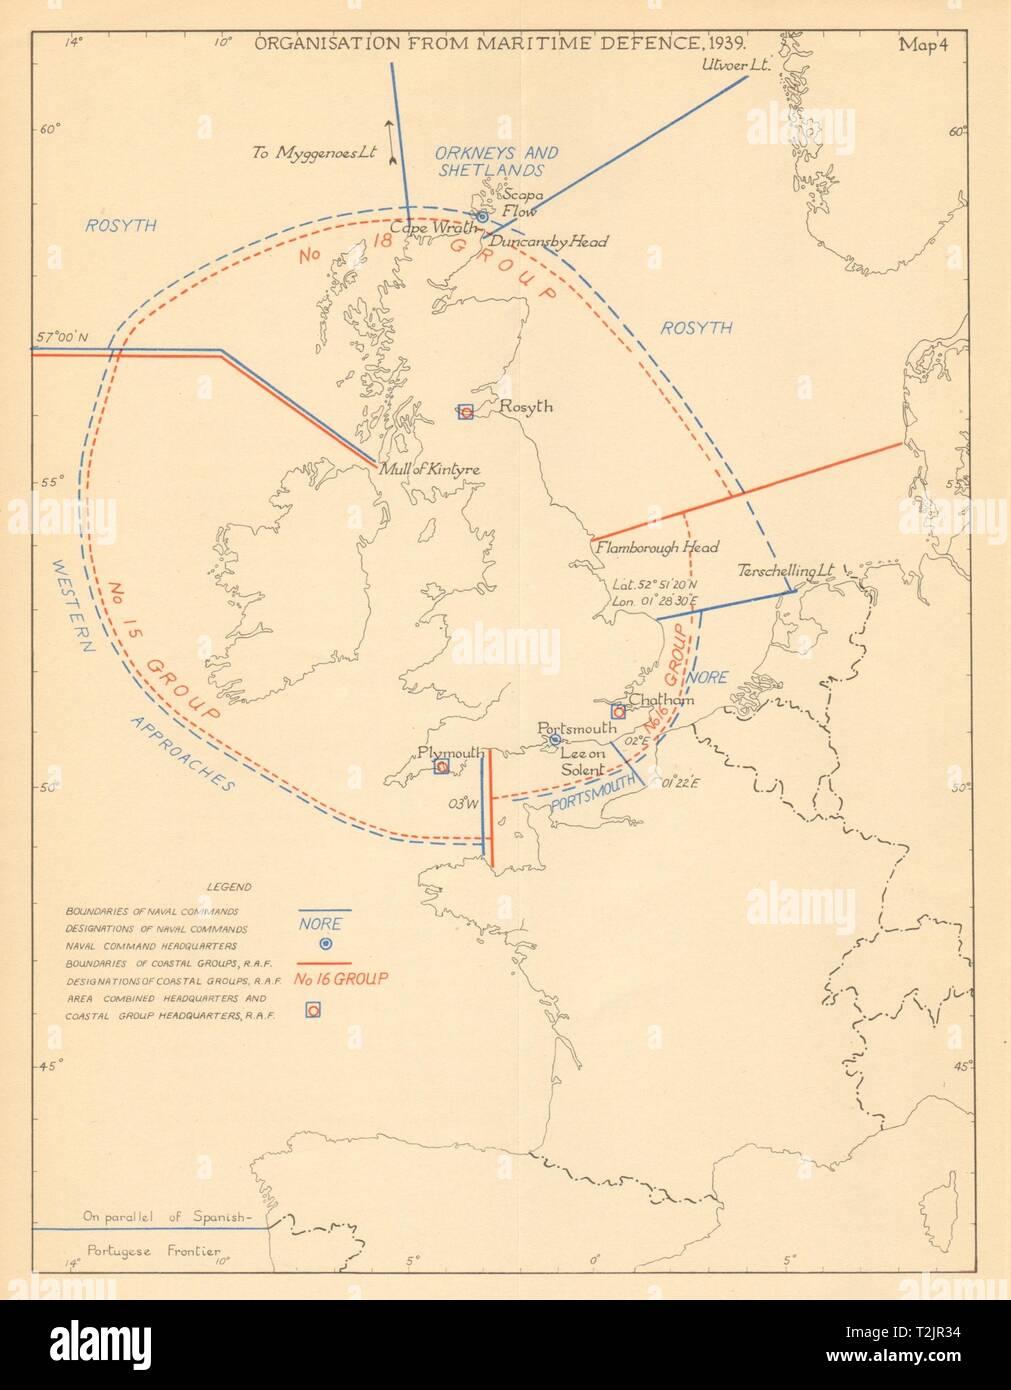 UK Maritime Defence organisation 1939. World War 2. Operation Sealion 1957 map - Stock Image